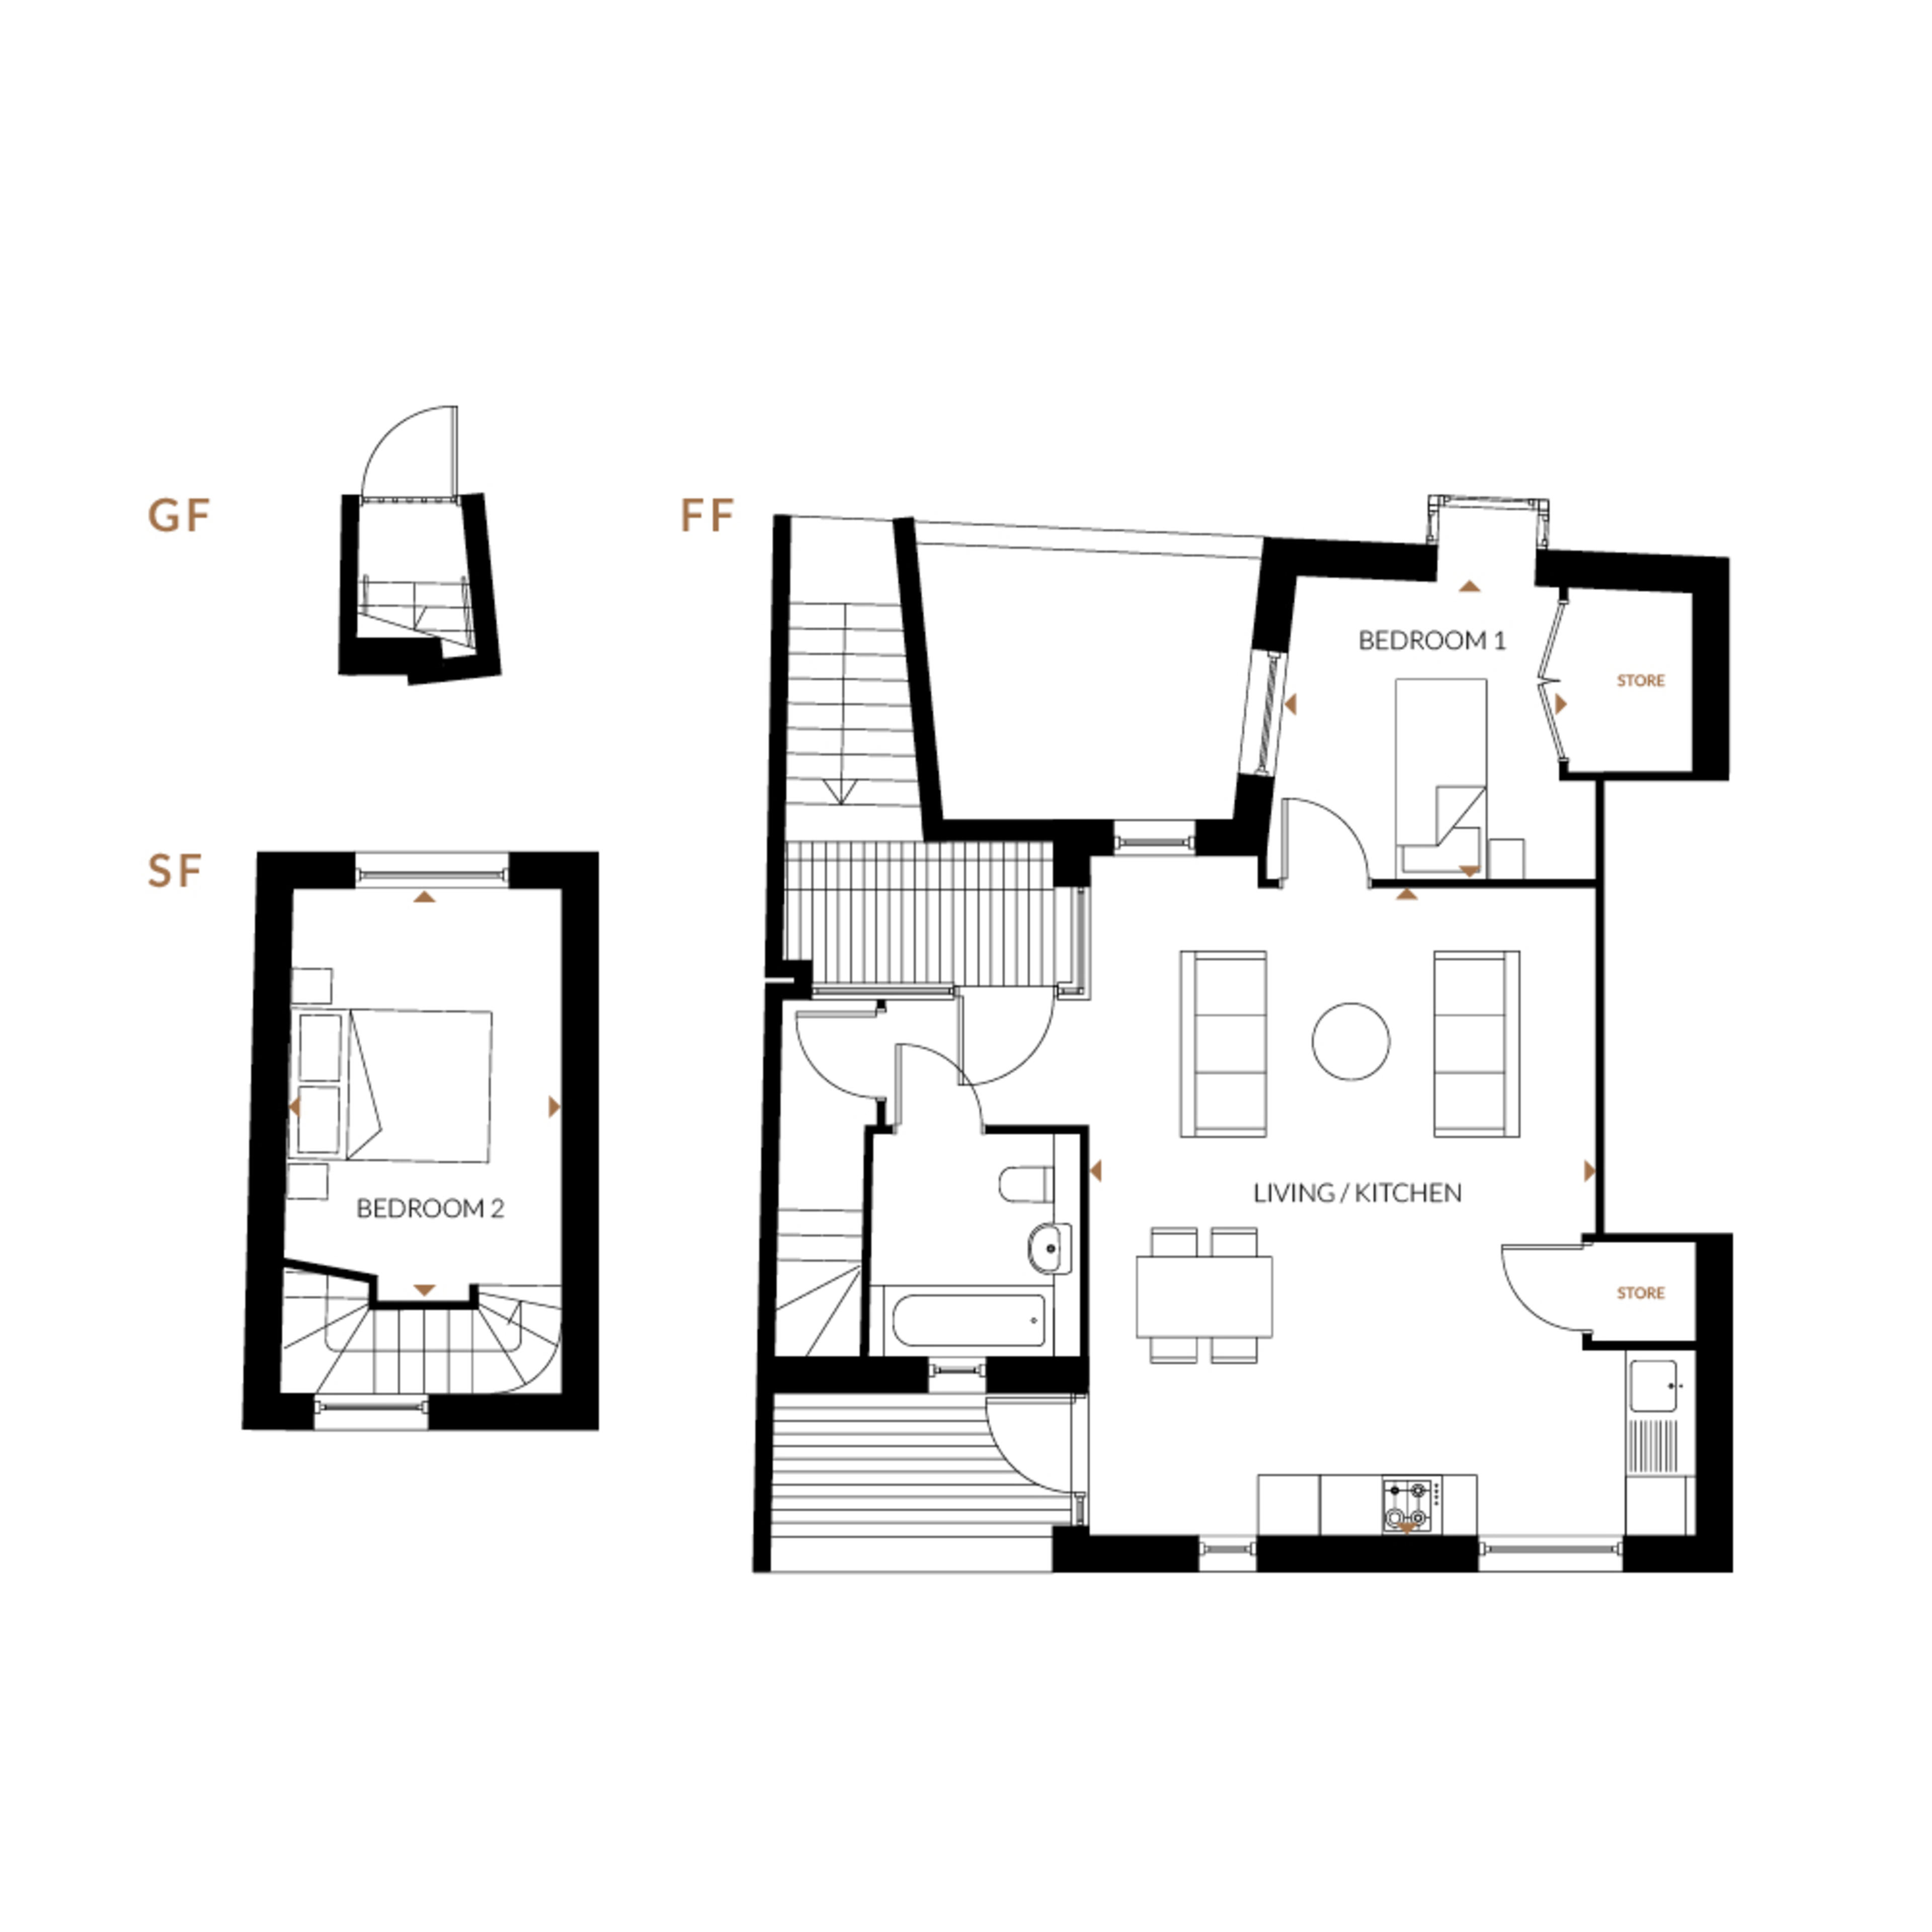 Edgewood-mews-floorplan-2-bed-type-C